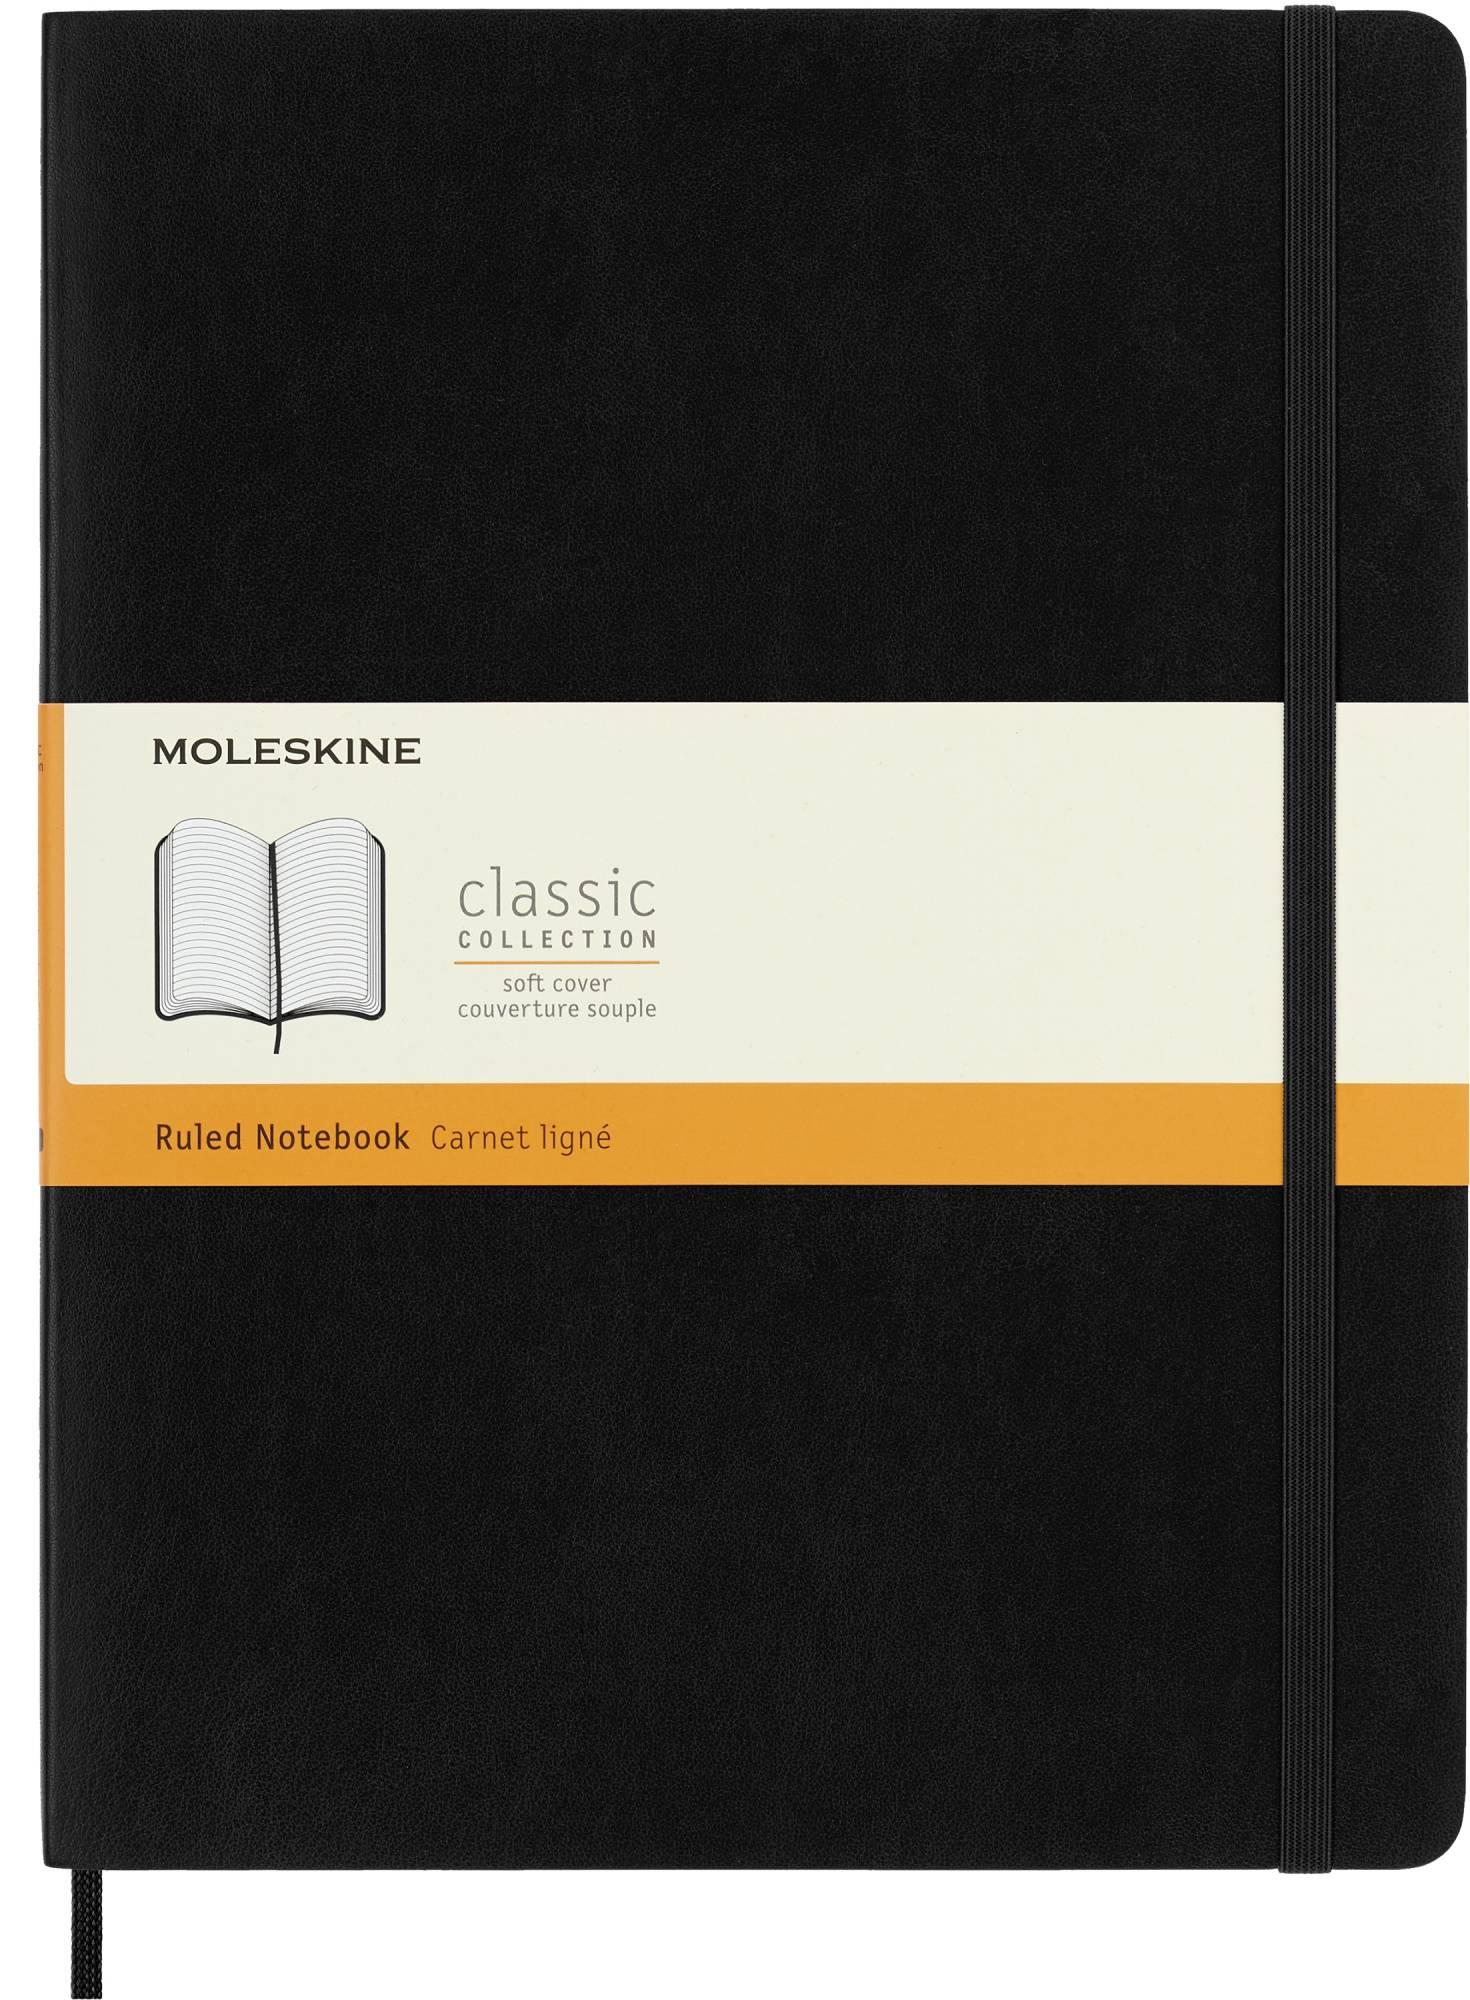 Блокнот Moleskine CLASSIC SOFT 190х250мм 192стр. линейка мягкая обложка фиксирующая резинка черный - фото 1